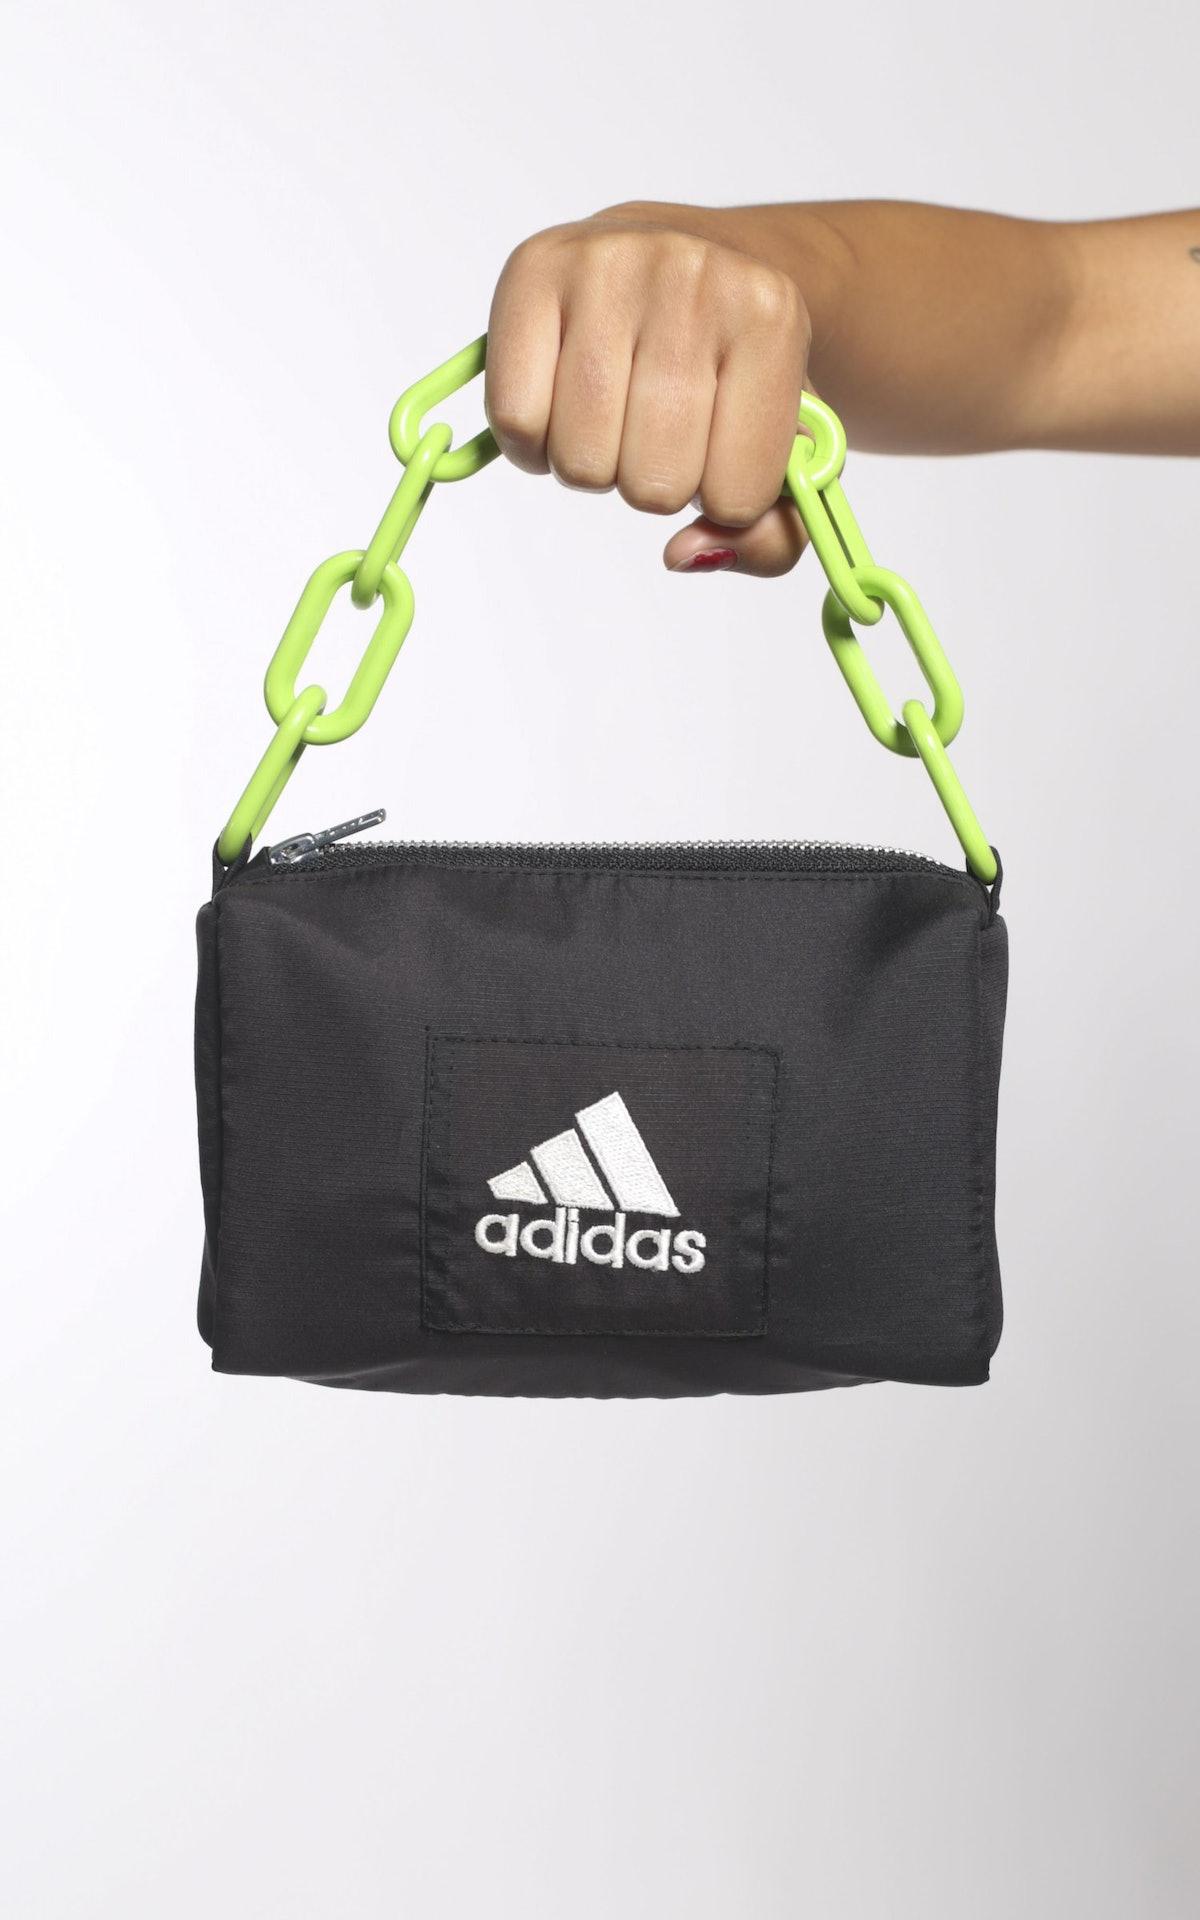 Vintage Rework Adidas Mini Chain Bag